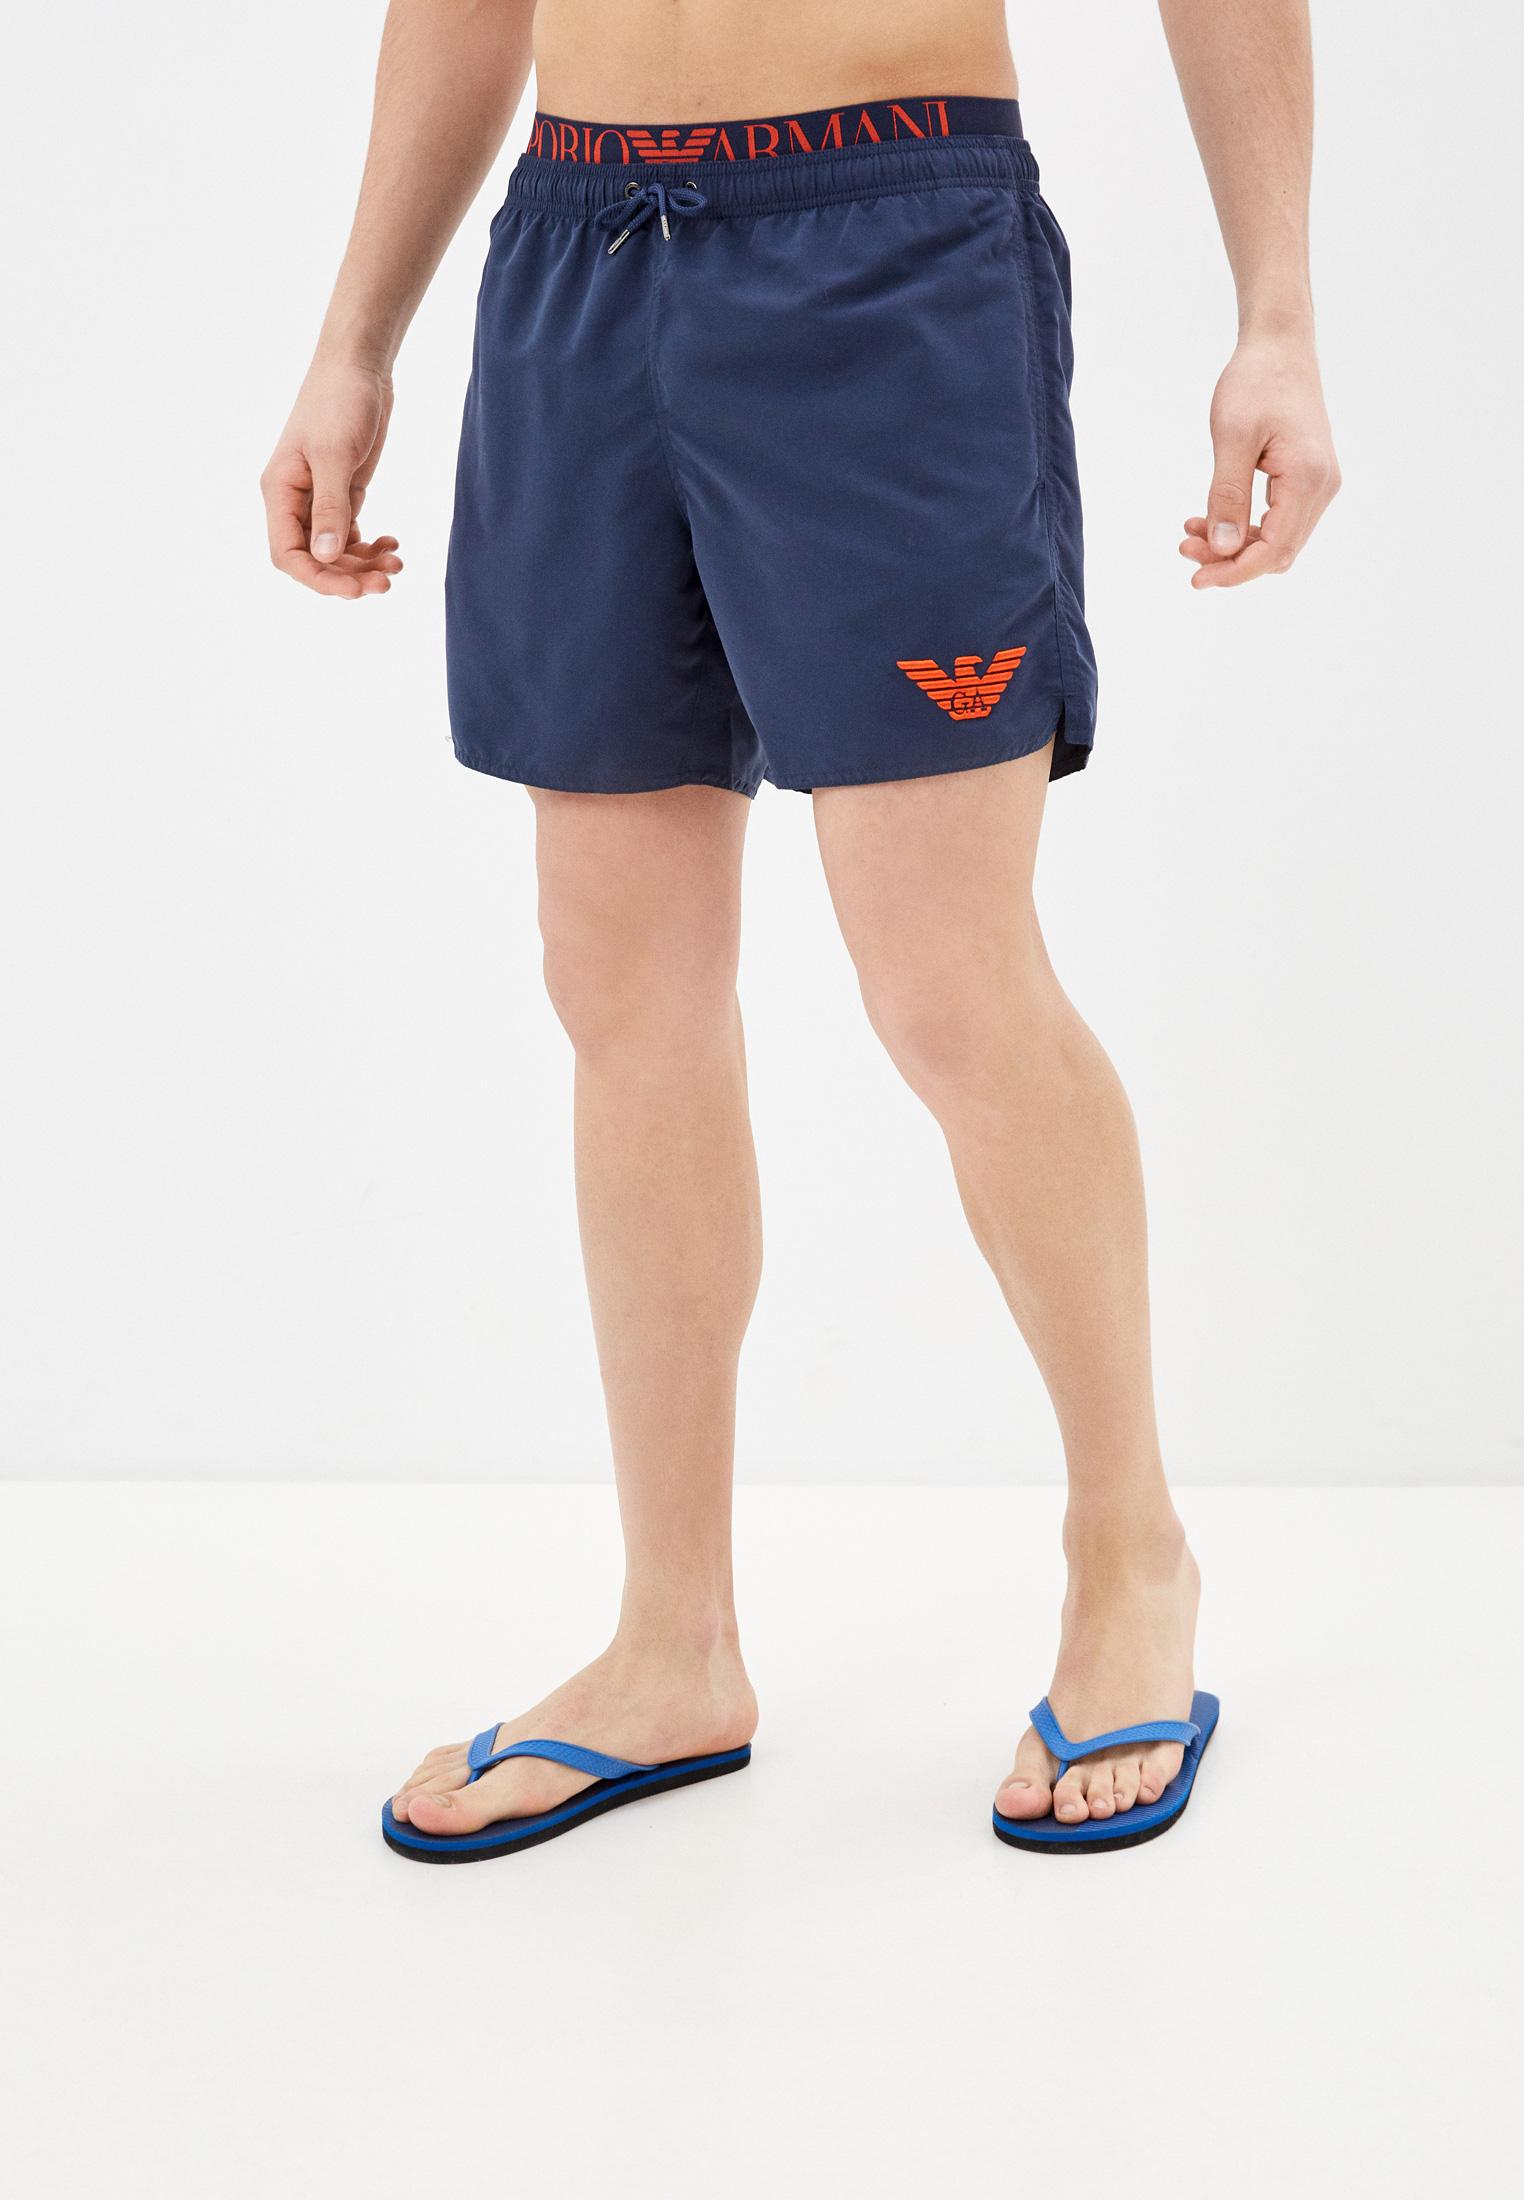 Мужские шорты для плавания Emporio Armani (Эмпорио Армани) 2117401p432